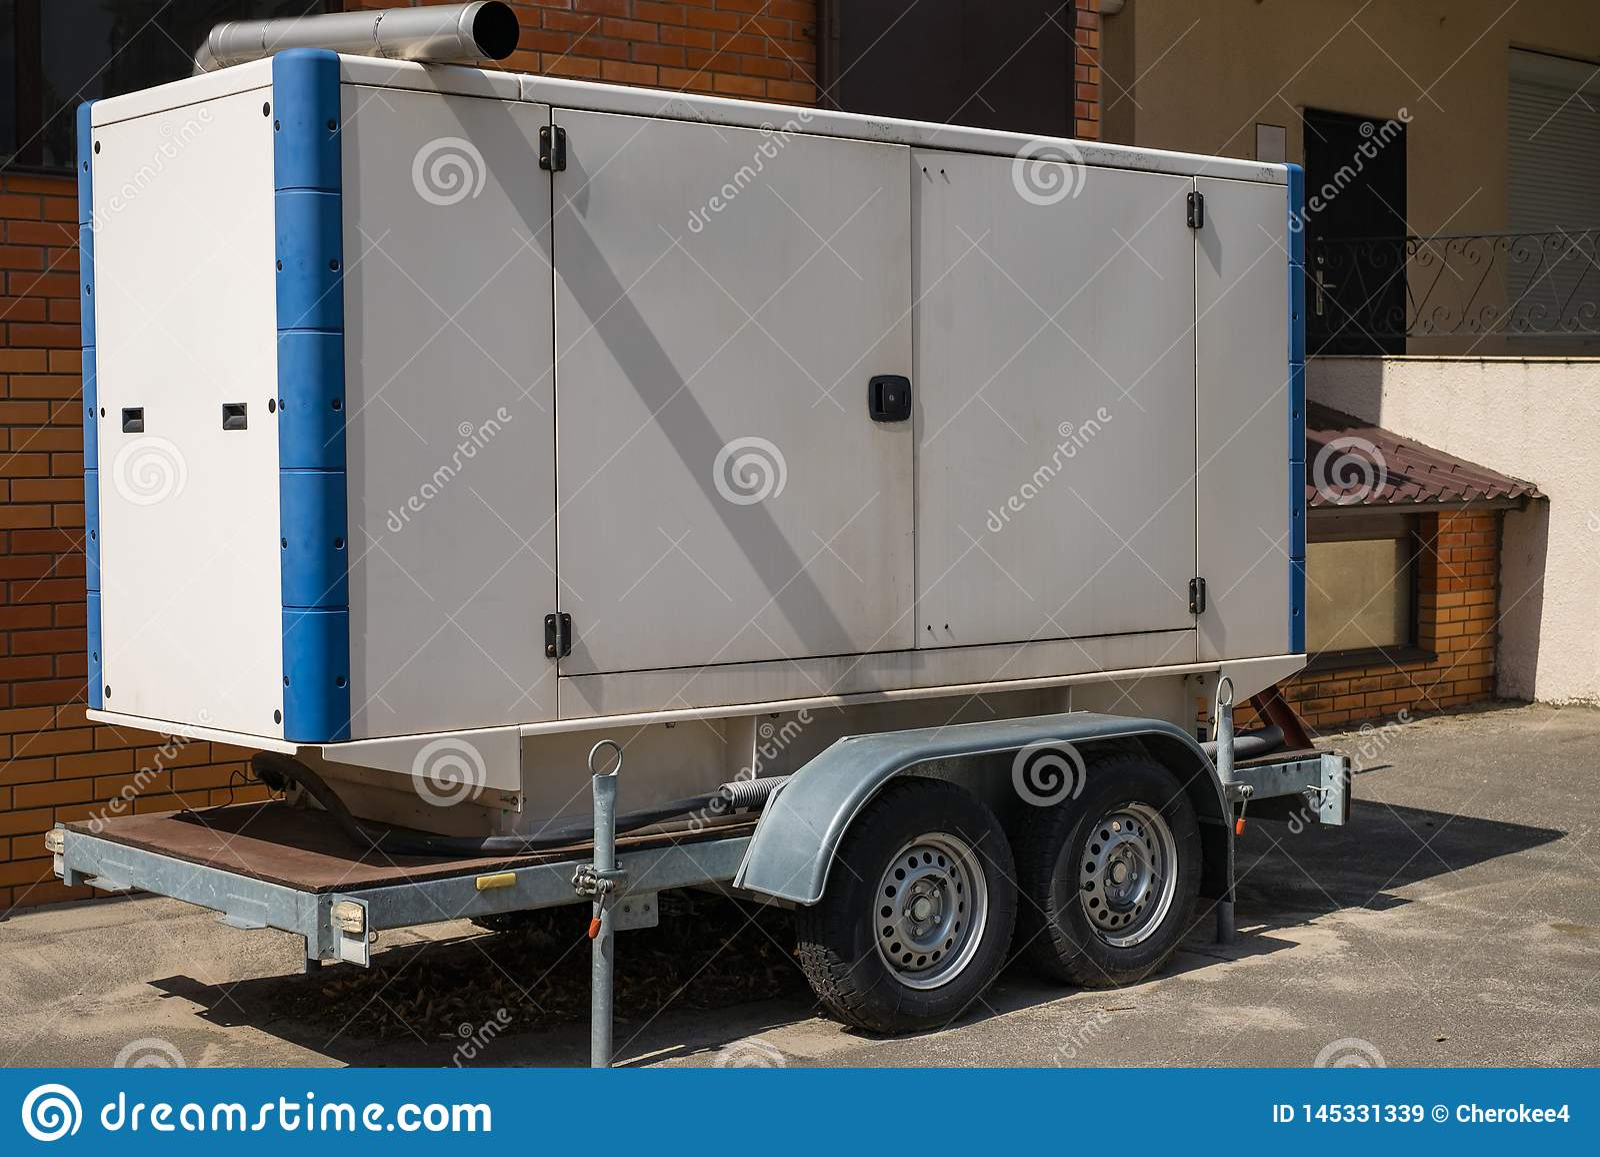 Mobile Diesel Generator For Emergency Electric Power On